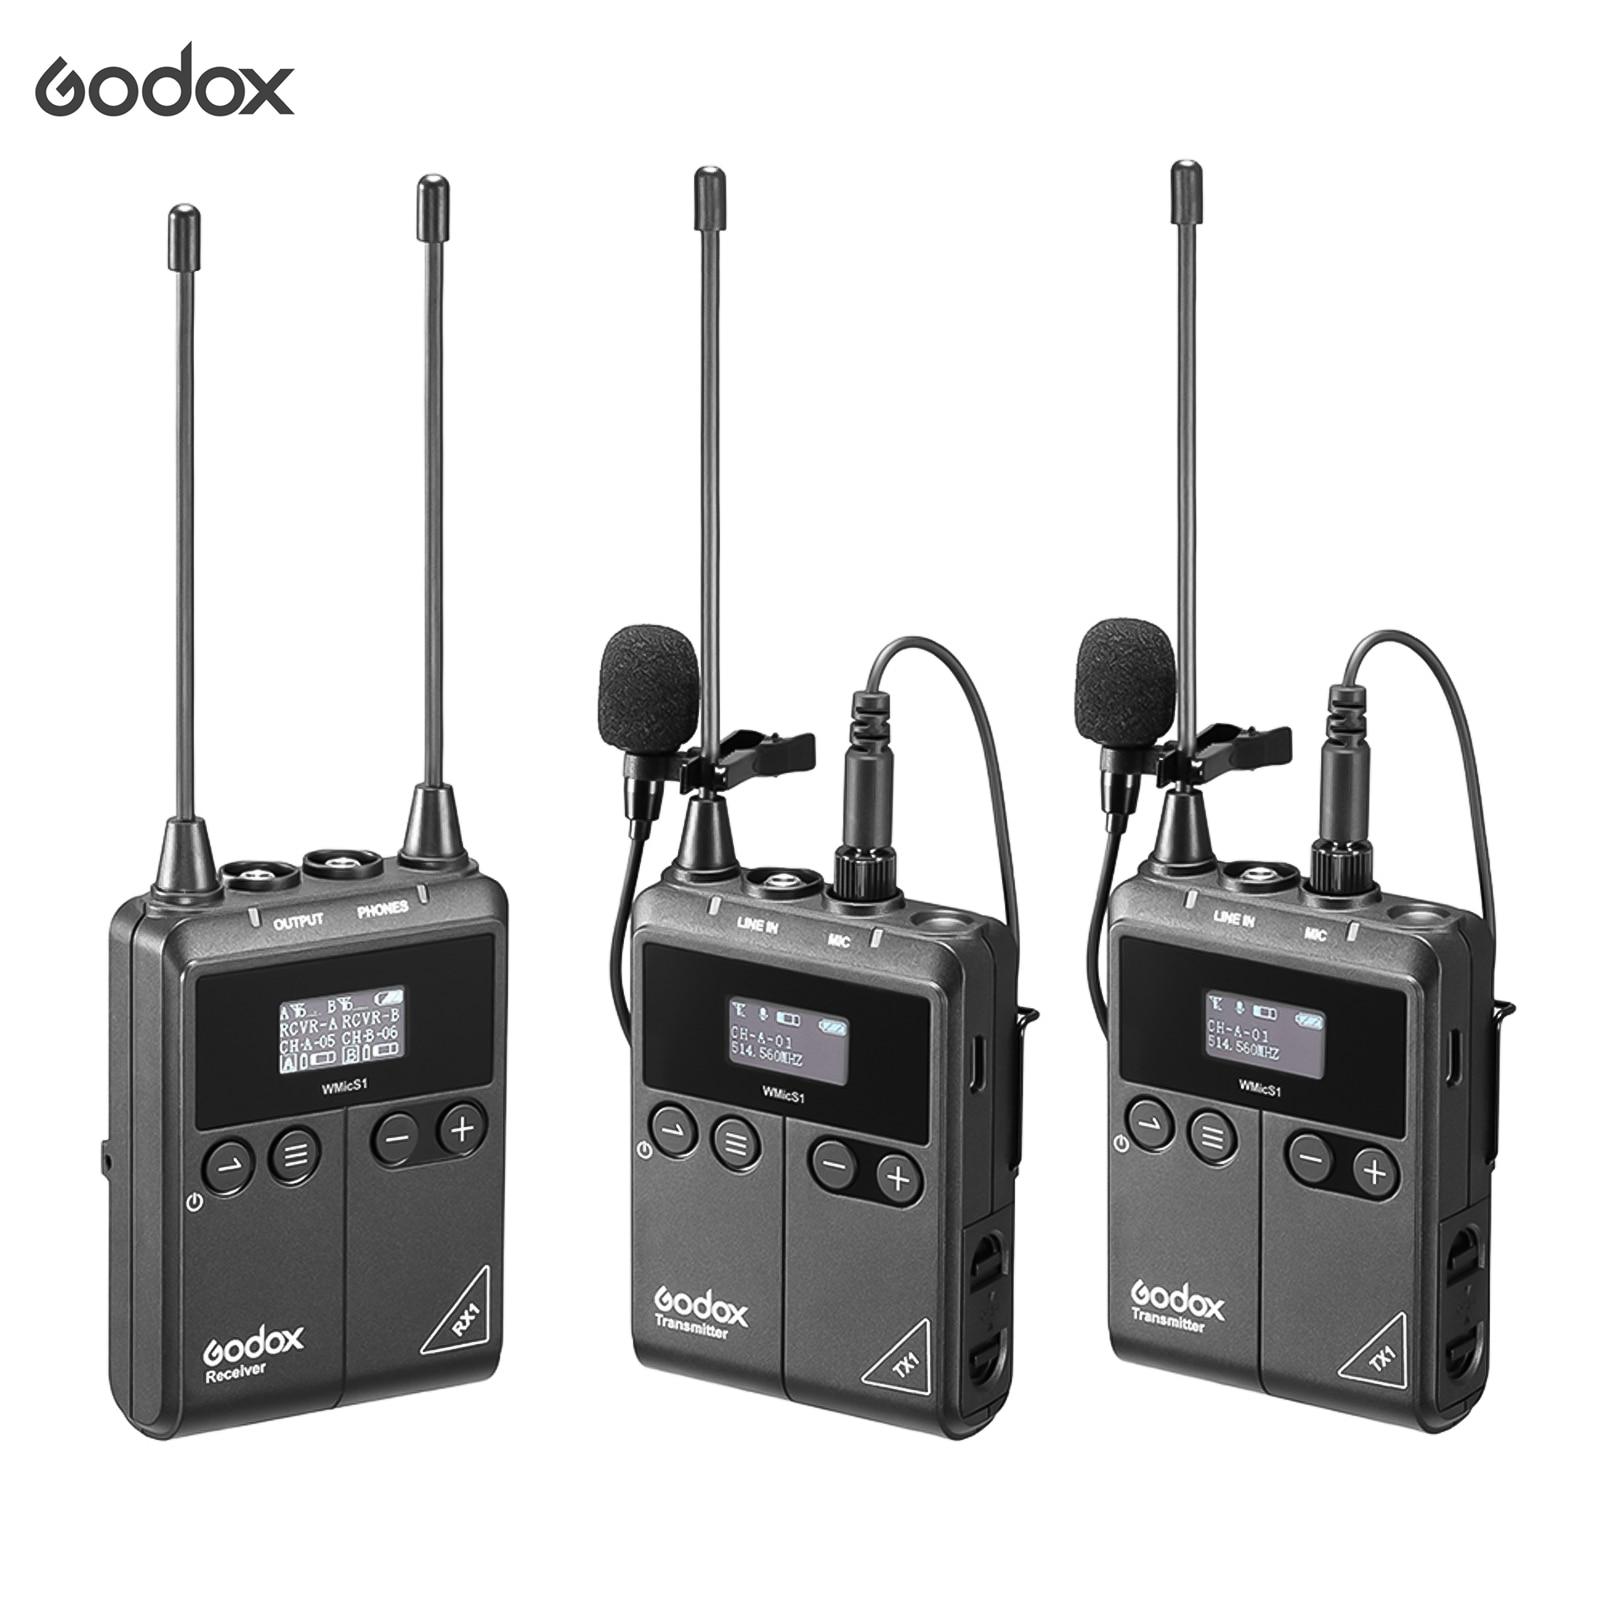 Godox wmics1 kit2 uhf microfone sem fio 2pcs tx1 transmissores corpo-pacote portátil + receptor rx1 para câmera smartphone vlog